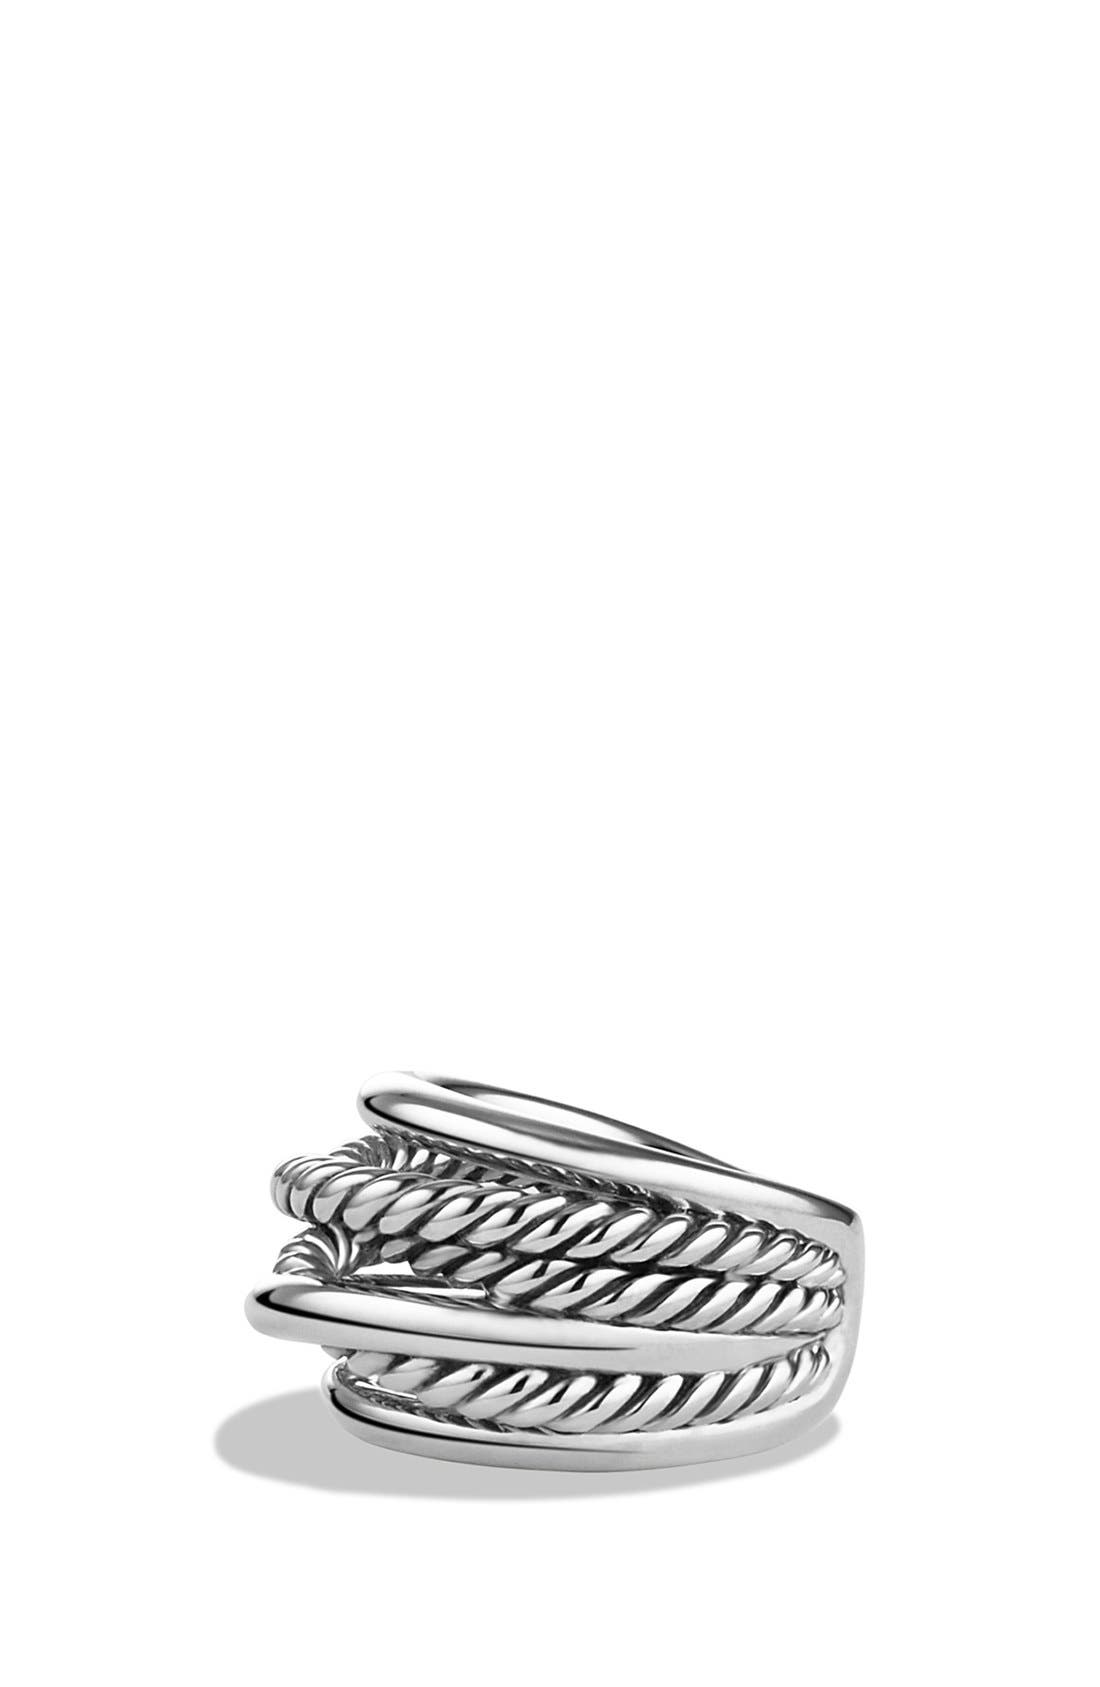 Main Image - David Yurman 'Crossover' Narrow Ring